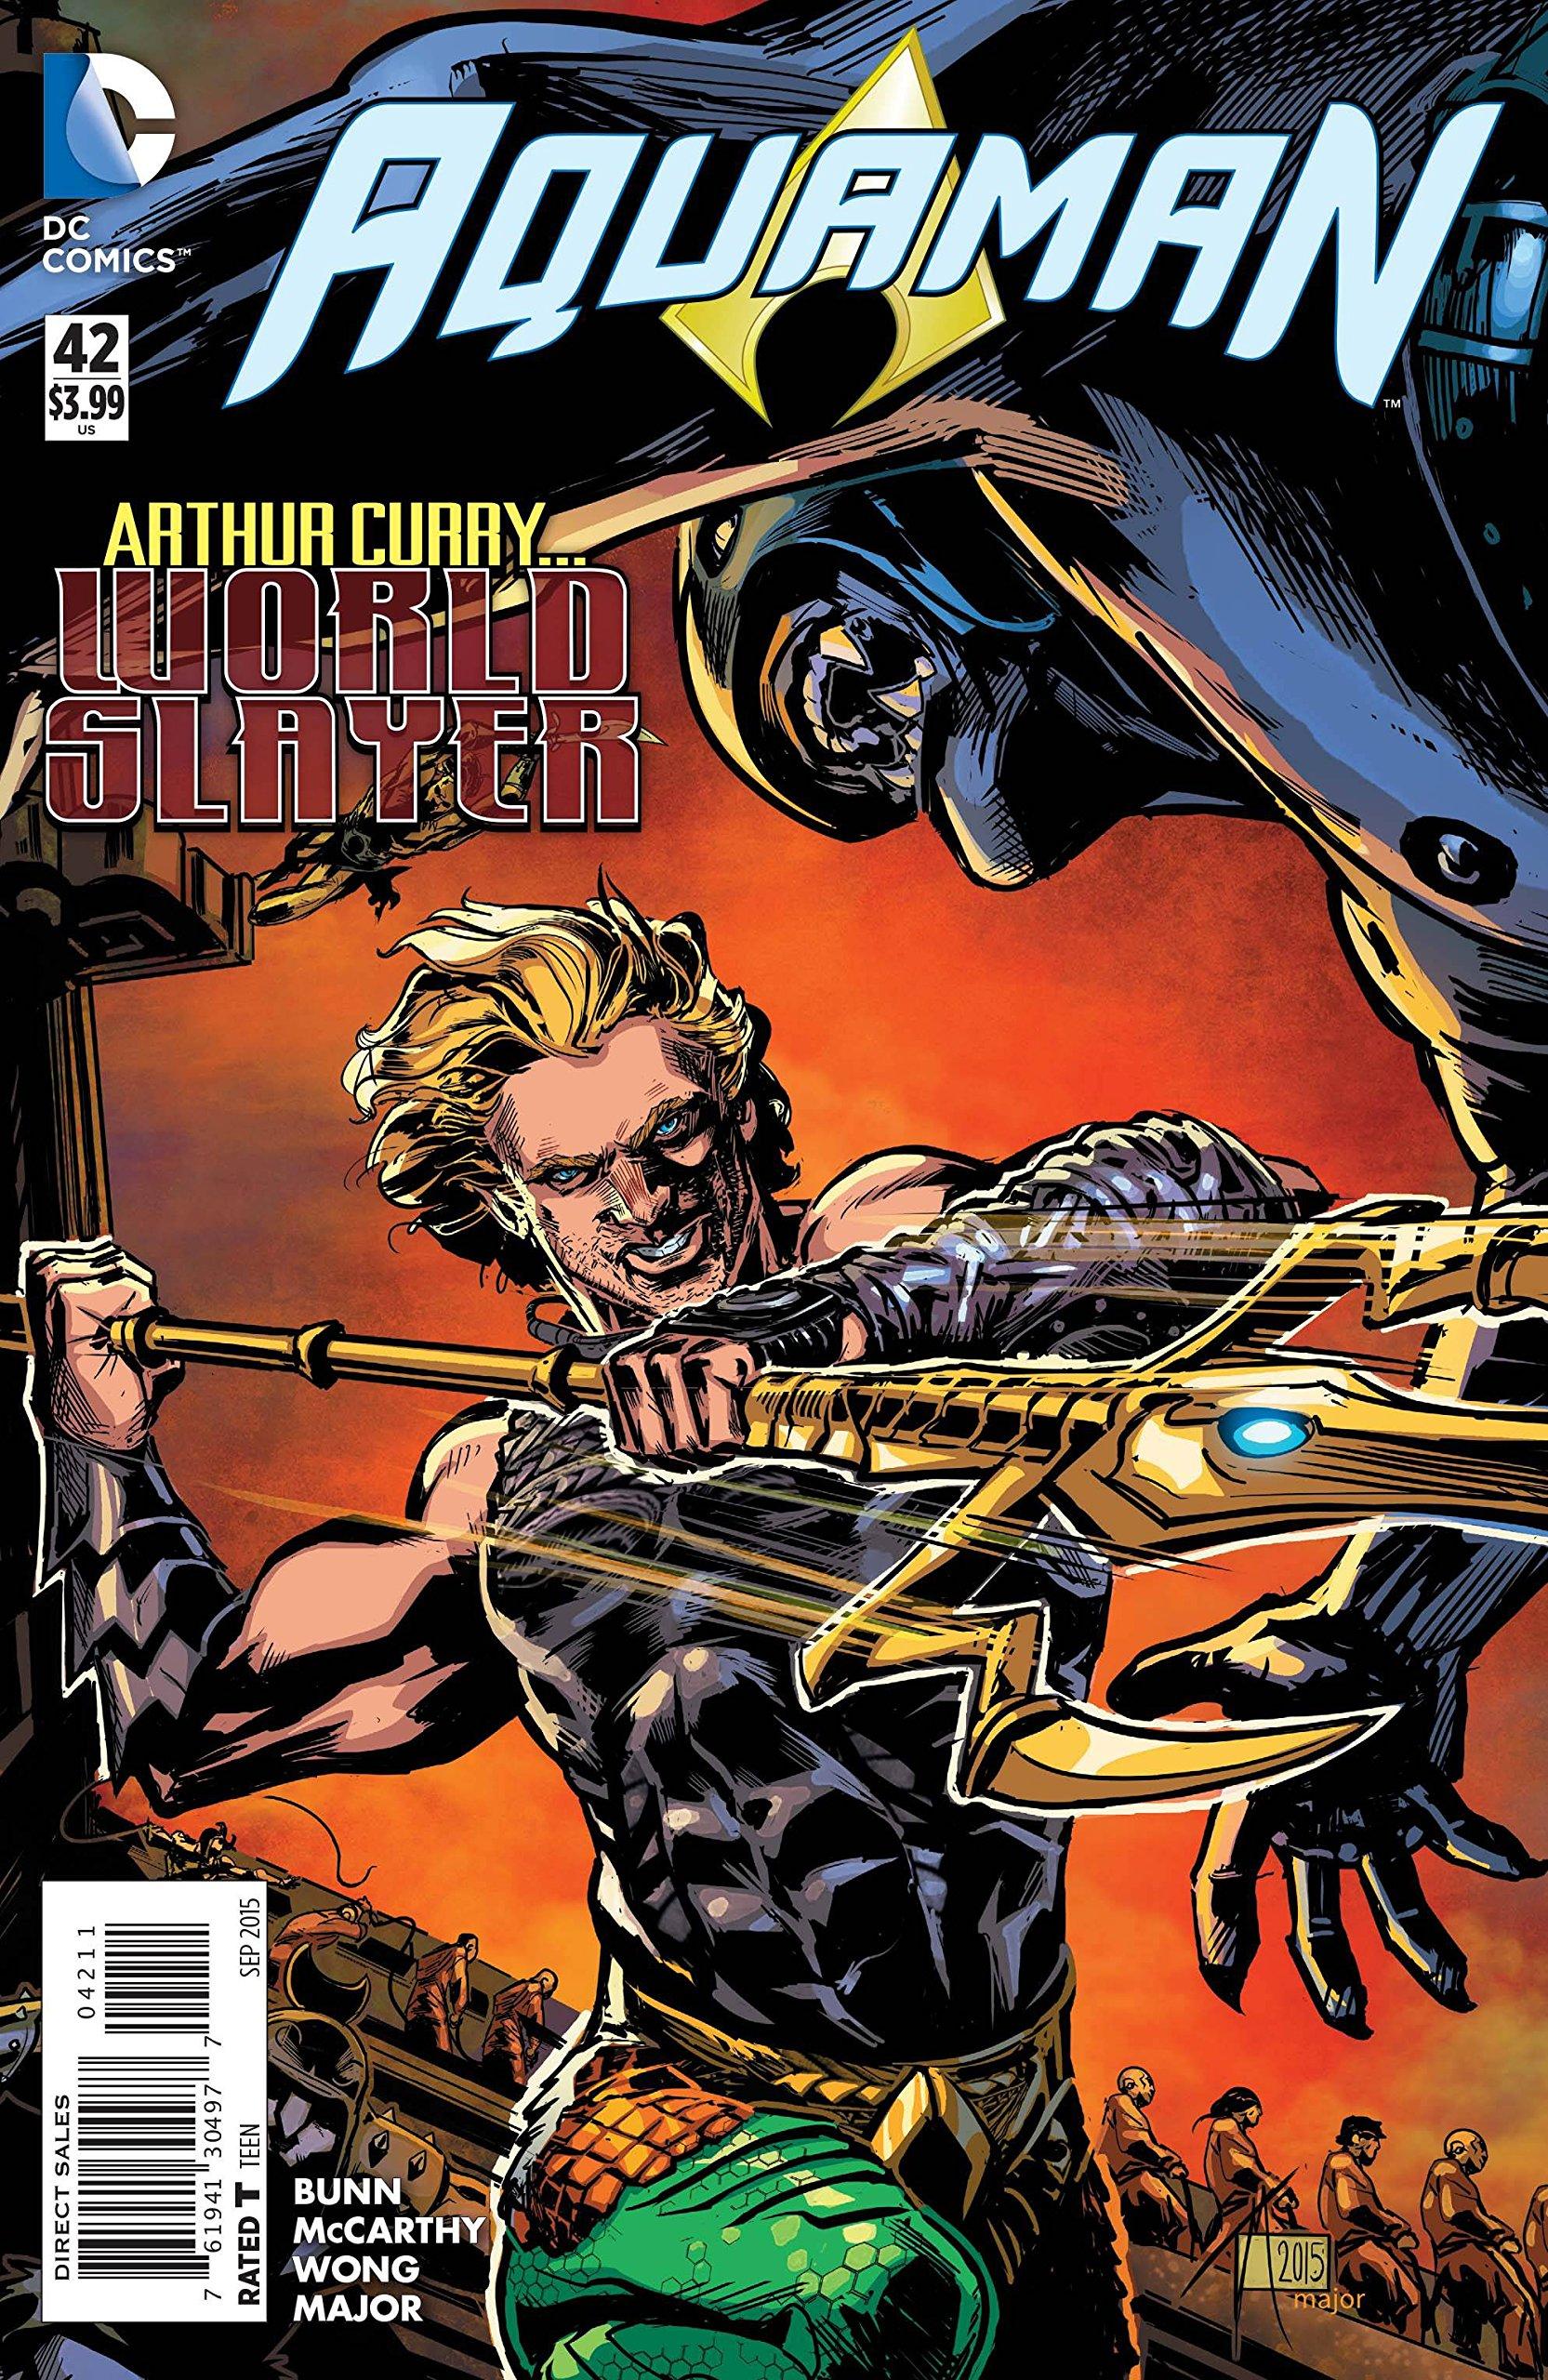 Download Aquaman #42 Main Cover pdf